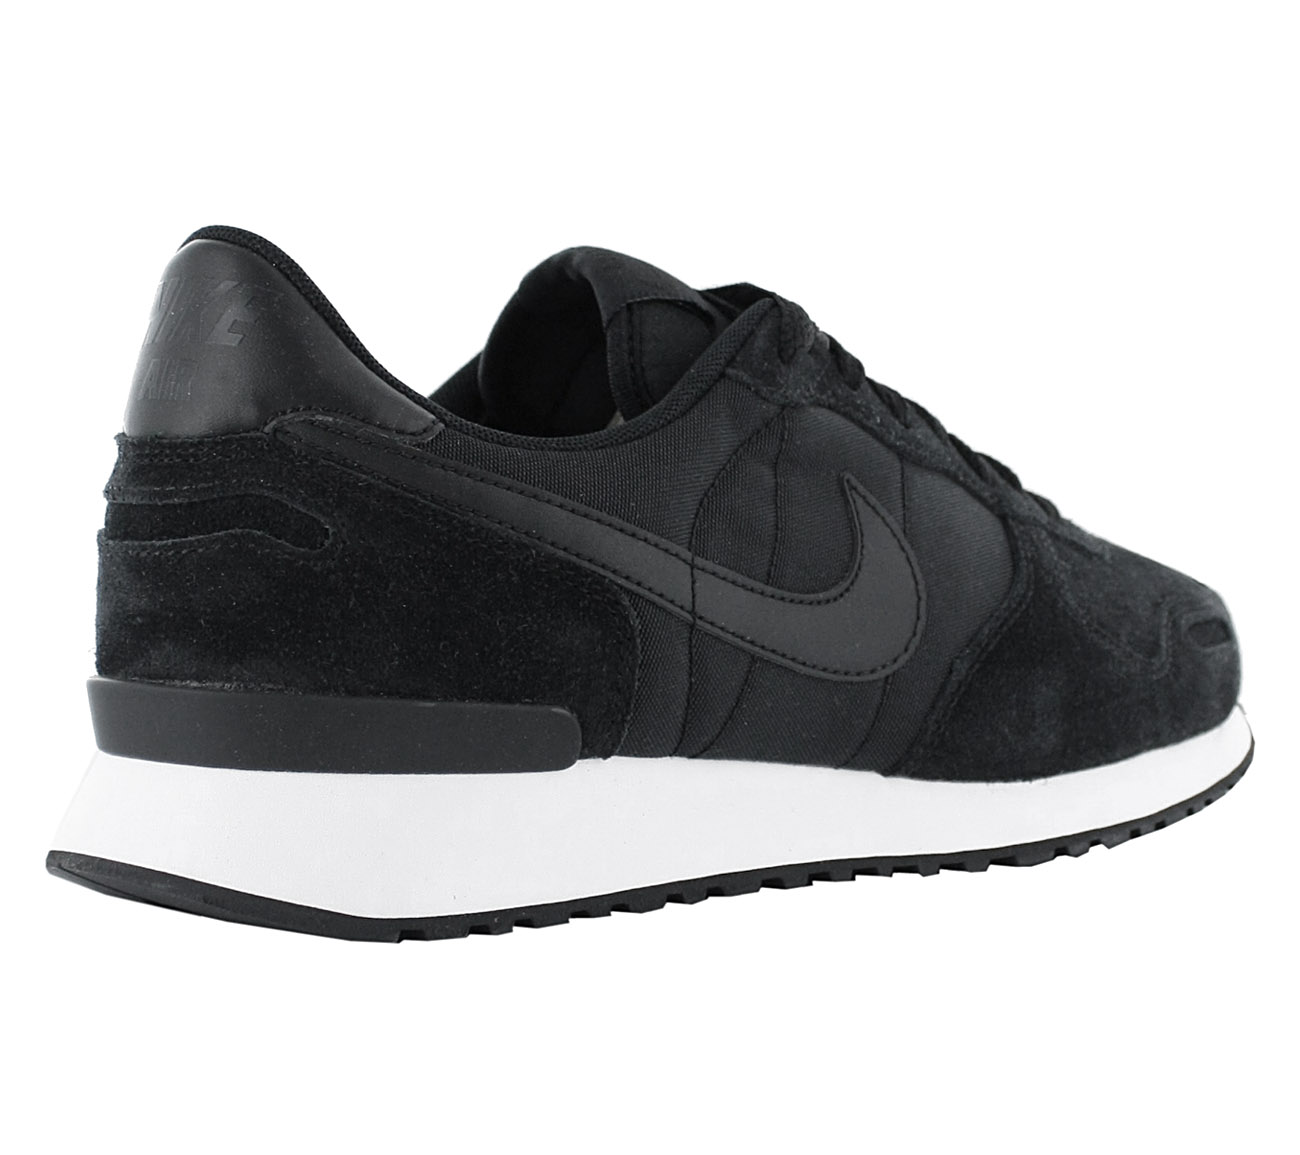 date de sortie: 6d964 797d3 NEUF NIKE AIR Vortex LTR 918206-001 Hommes Baskets Chaussures Sneaker SALE